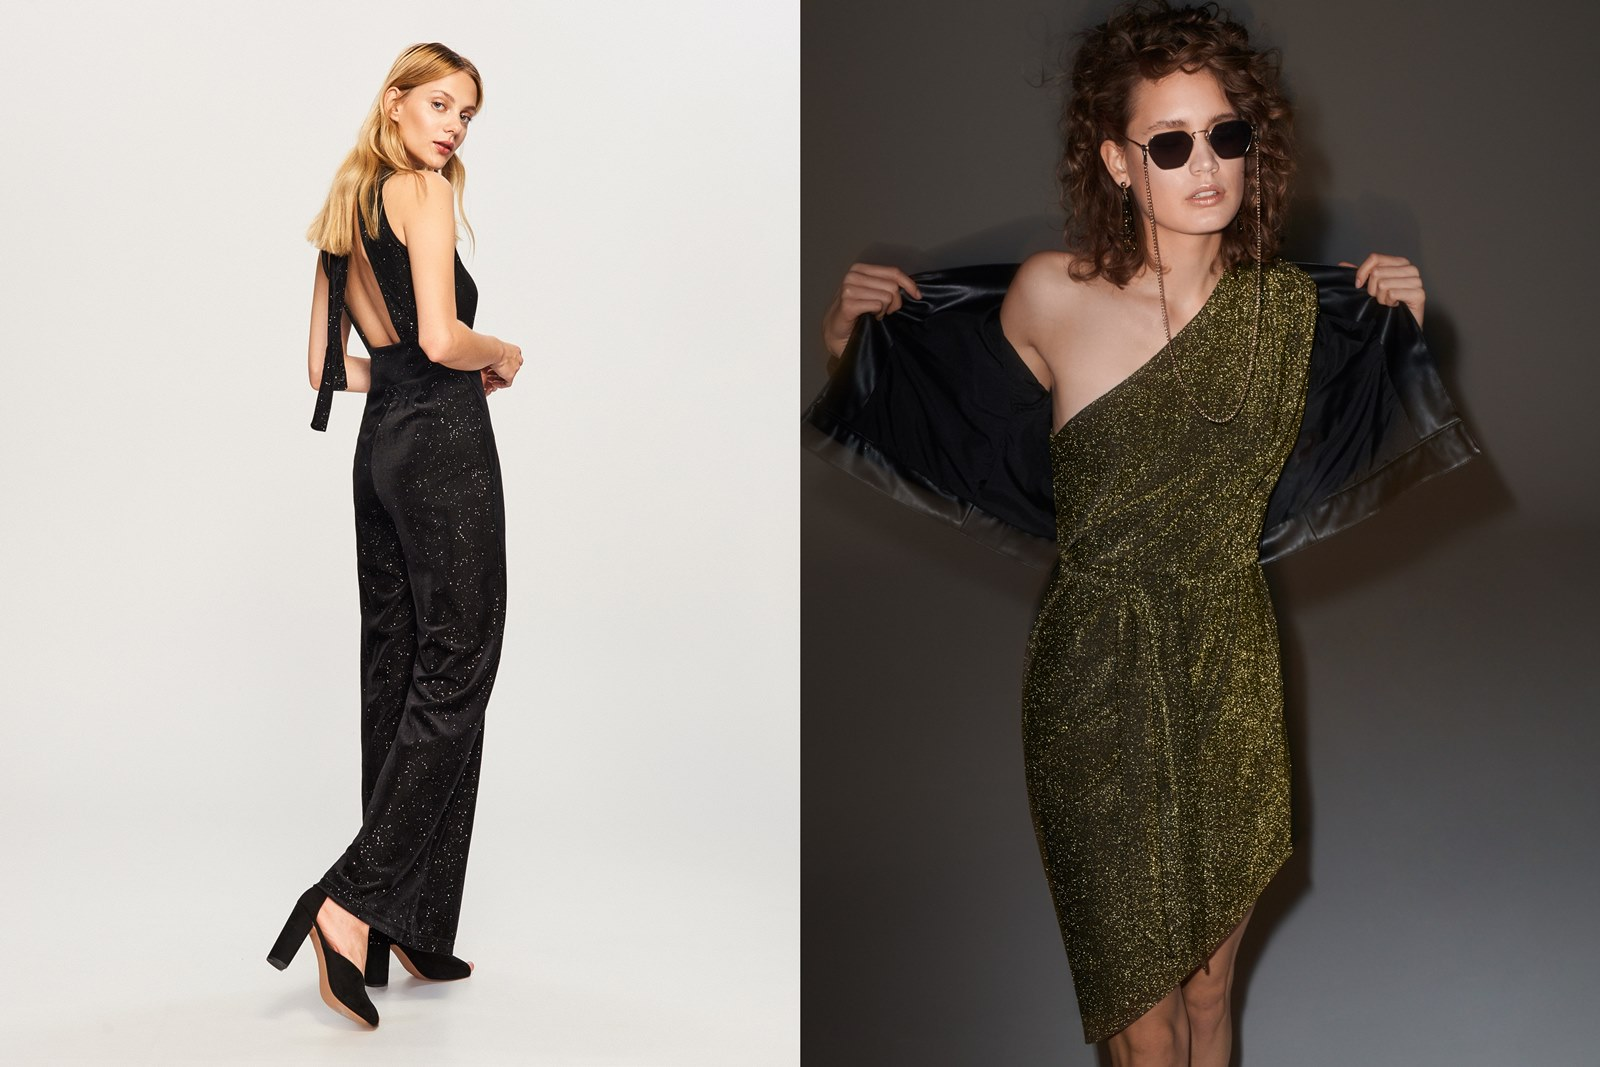 Jak się ubrać na Sylwestra, sukienki na sylwestra, sukienki sylwestrowe, sukienki do 80 złotych, sukienki do 100 złotych, sukienki do 150 złotych, sukienki do 200 złotych, sukienka w cekiny, sukienka błyszcząca, kombinezon do 100 złotych, sukienka wieczorowa, sukienka na imprezę, sukienka mini, sukienka midi, sinsay, reserved, reserved x vogue, vogue, mohito, h&m, stradivarius, zara, bershka